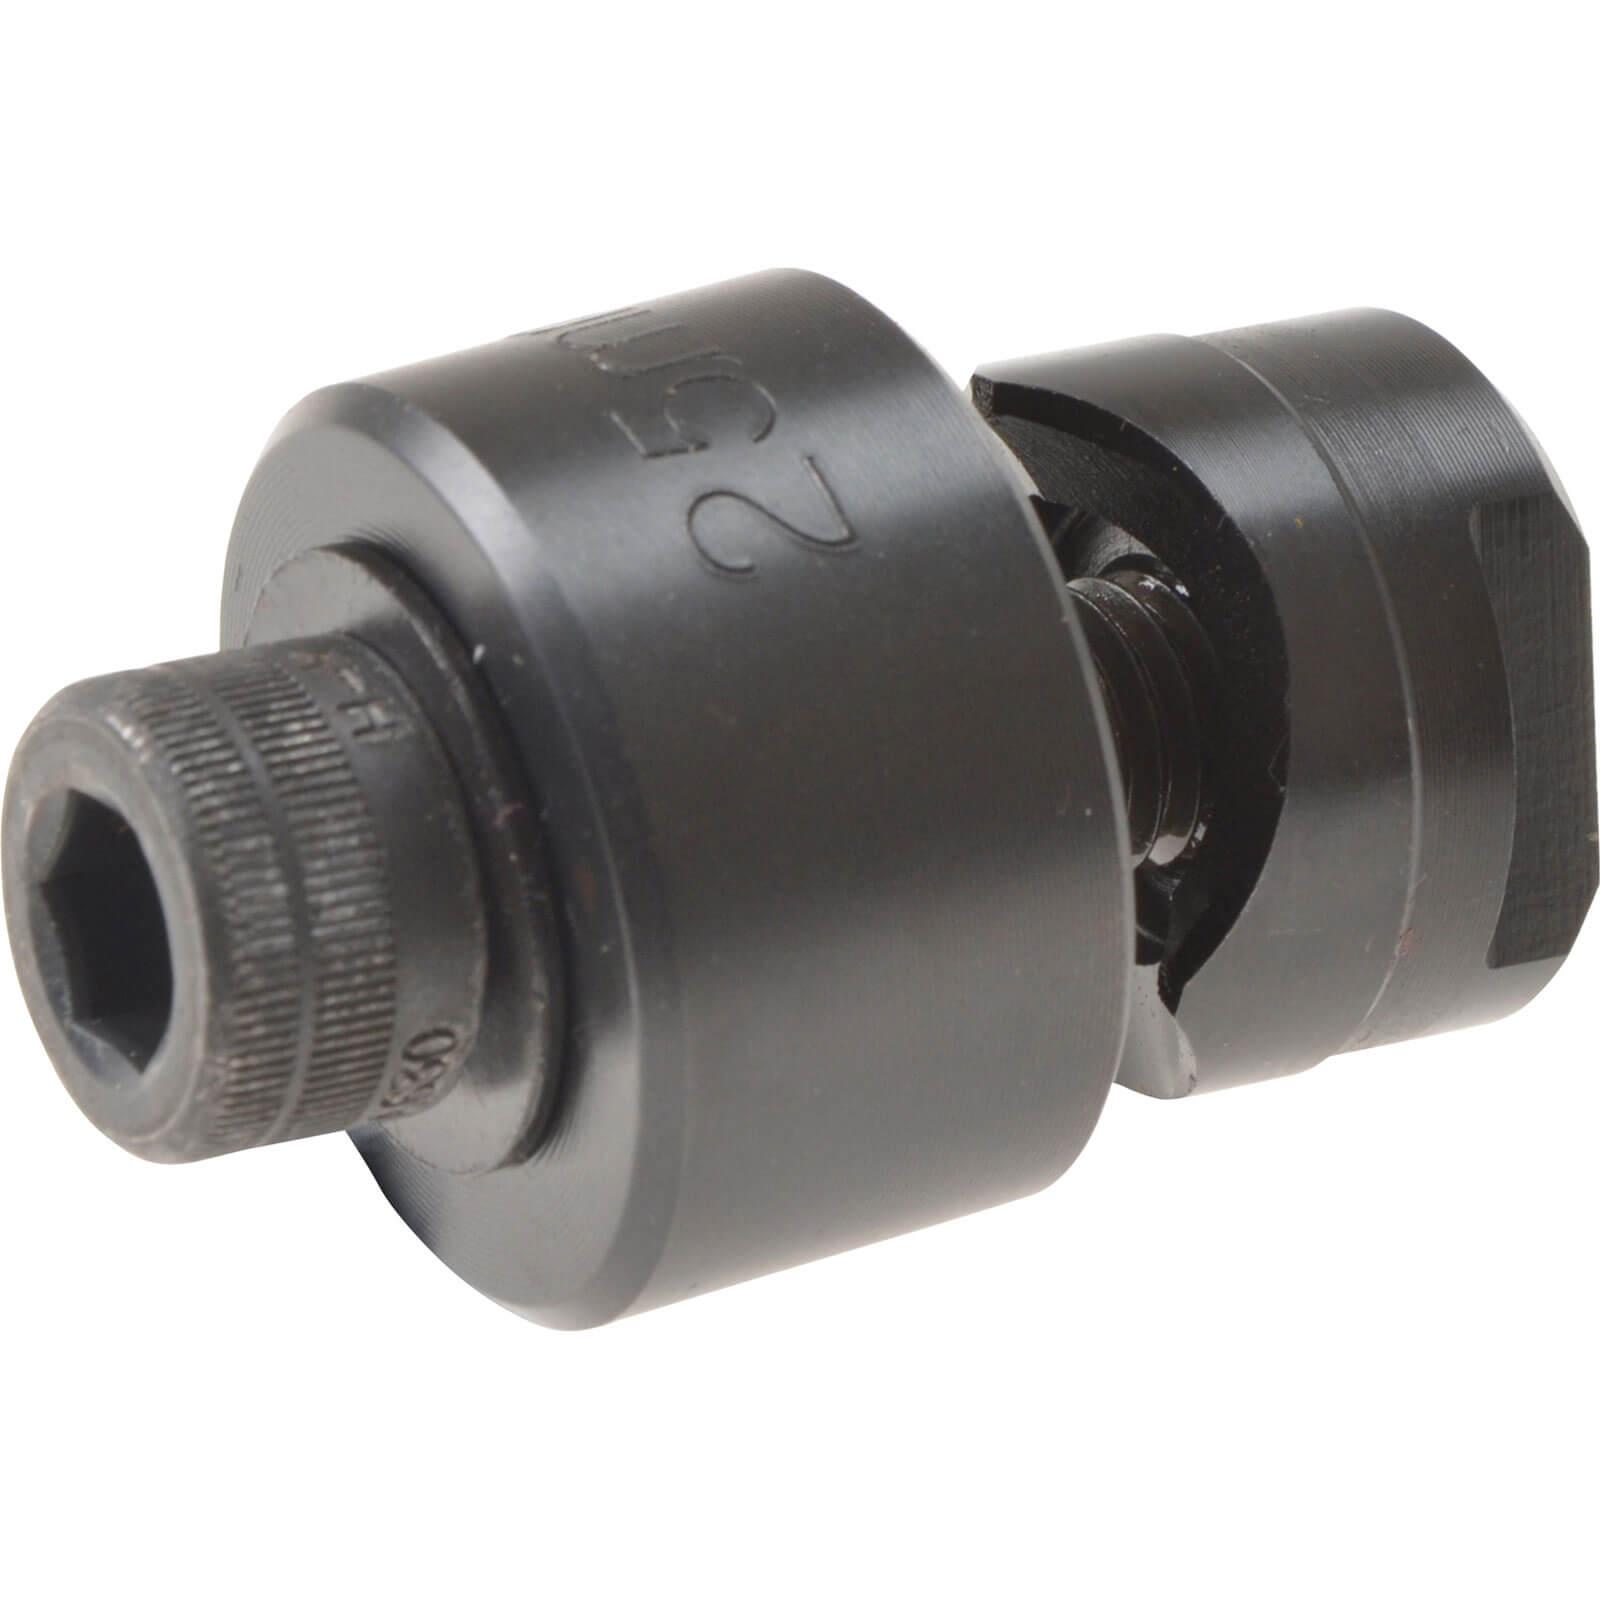 Image of Q Max Sheet Metal Hole Punch Metric 24mm